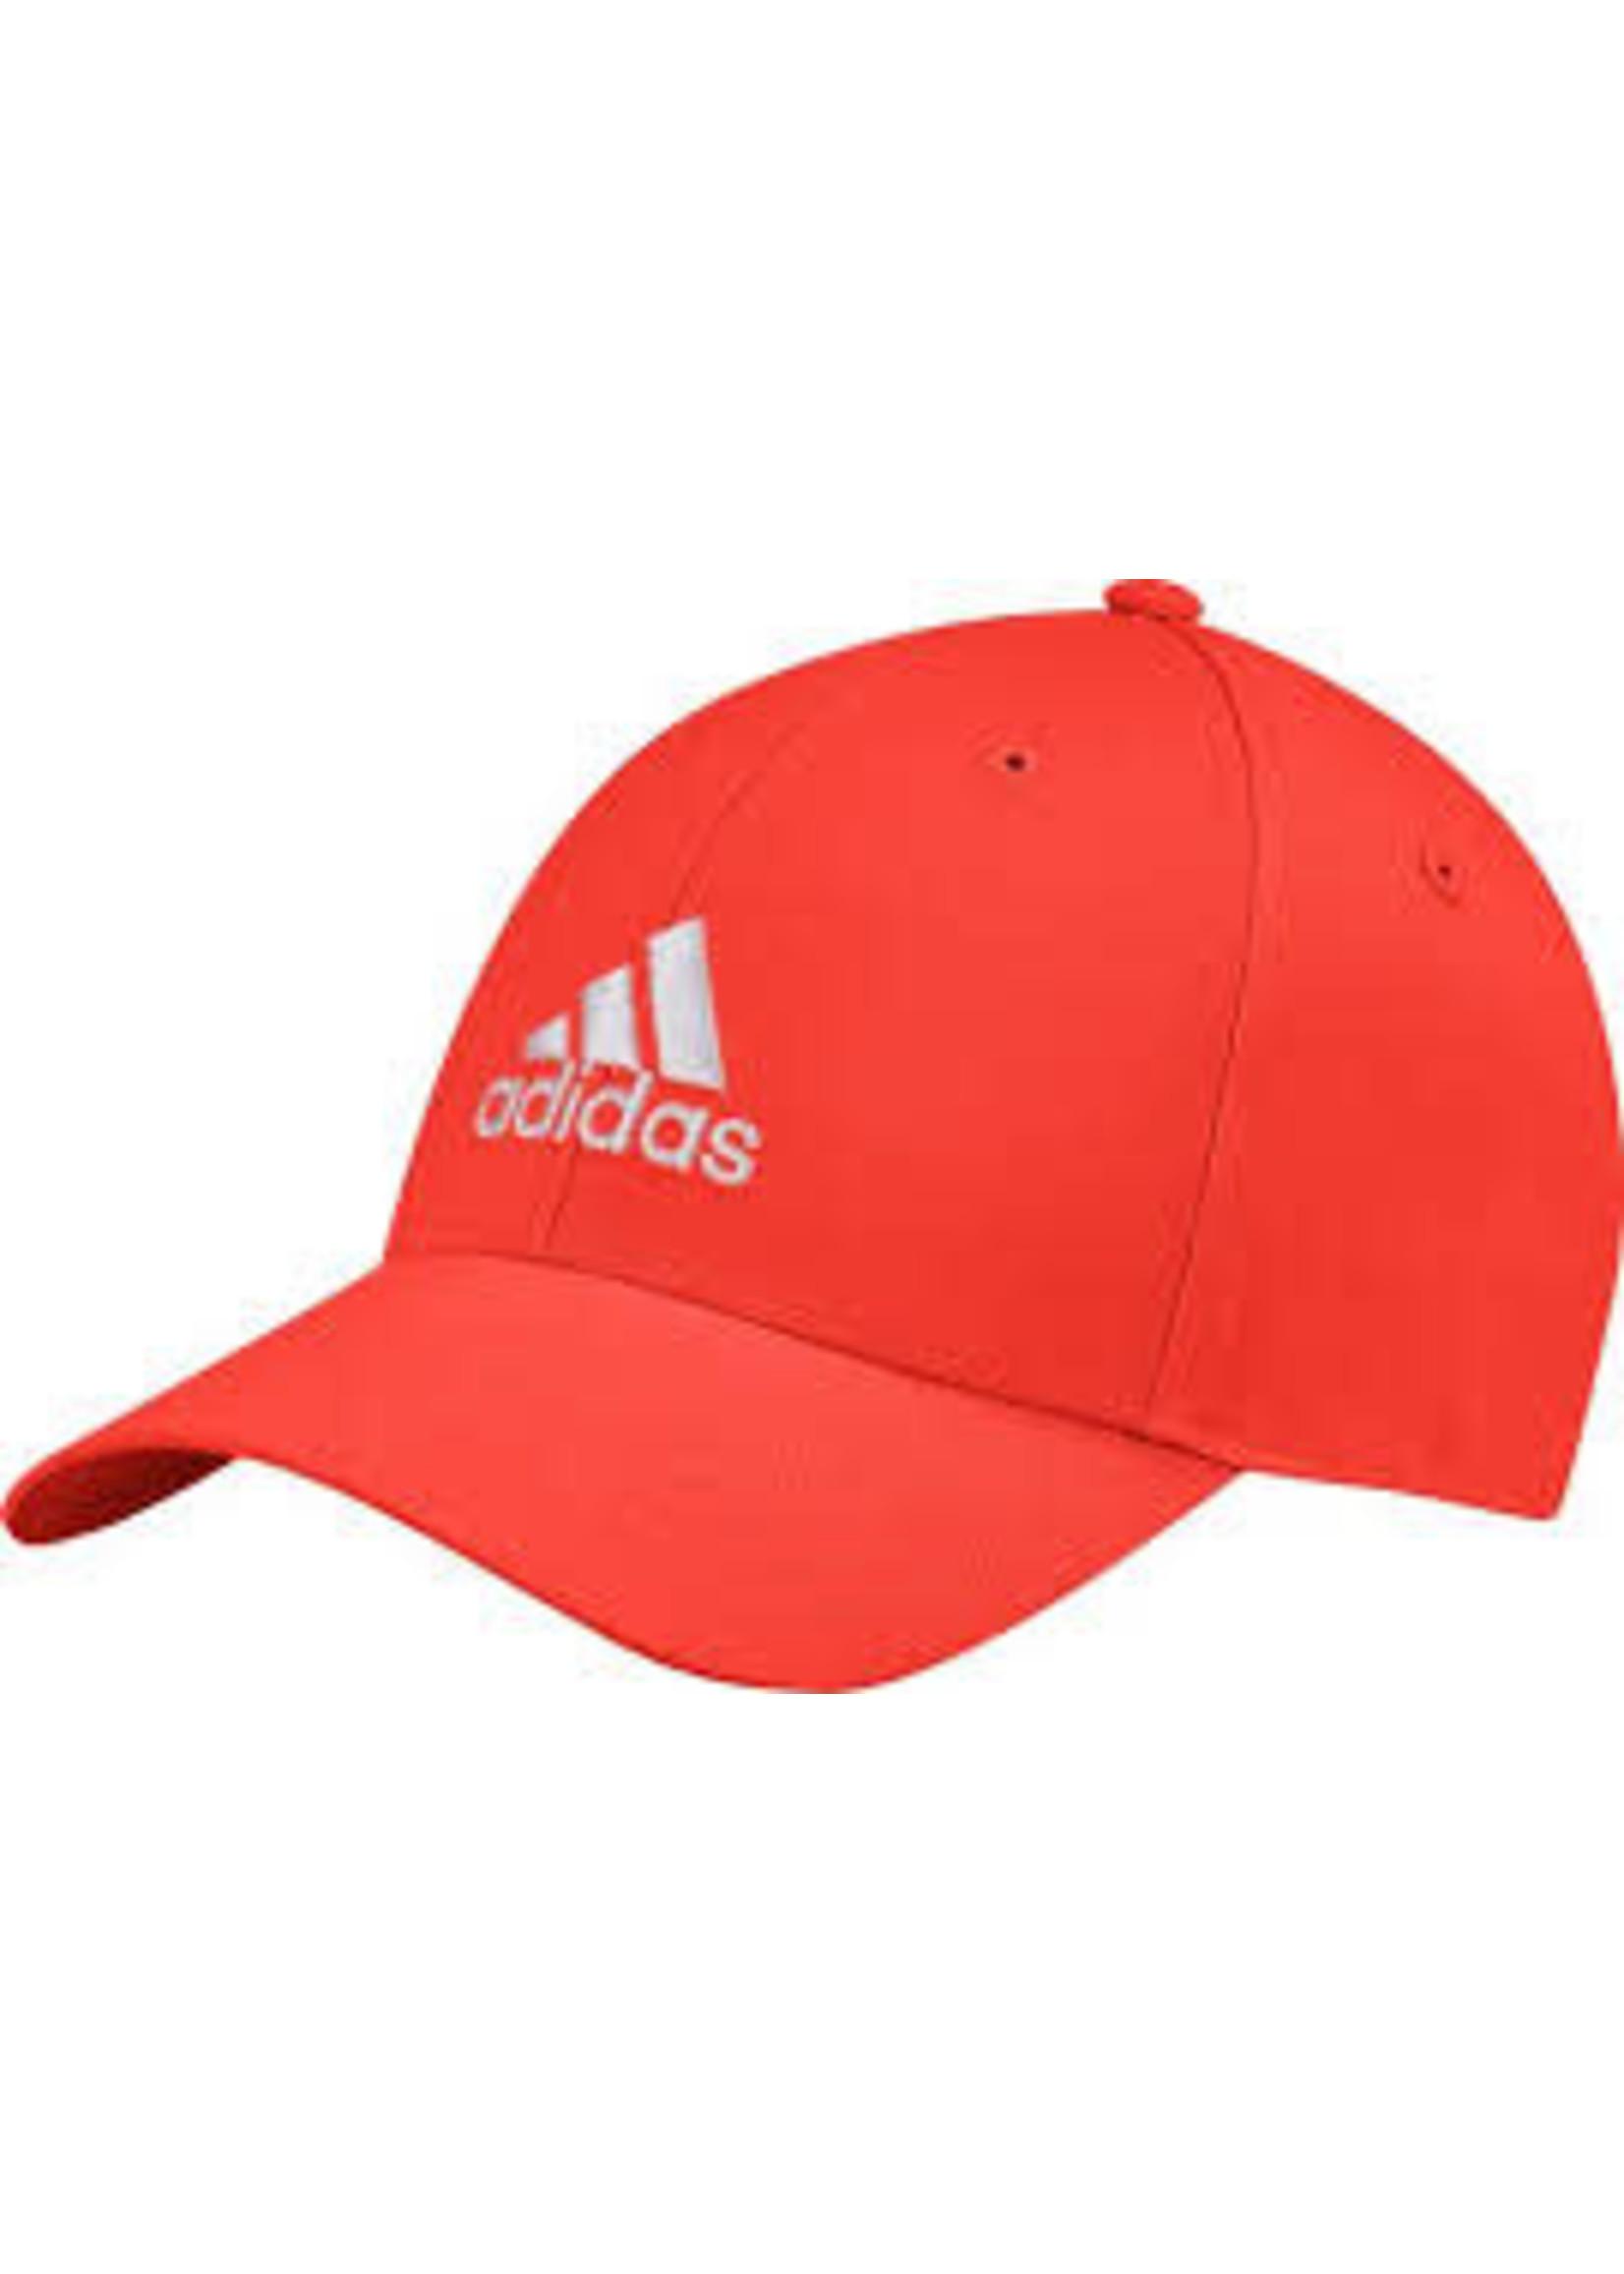 Adidas Adidas Baseball Cap, Red/White (2020)